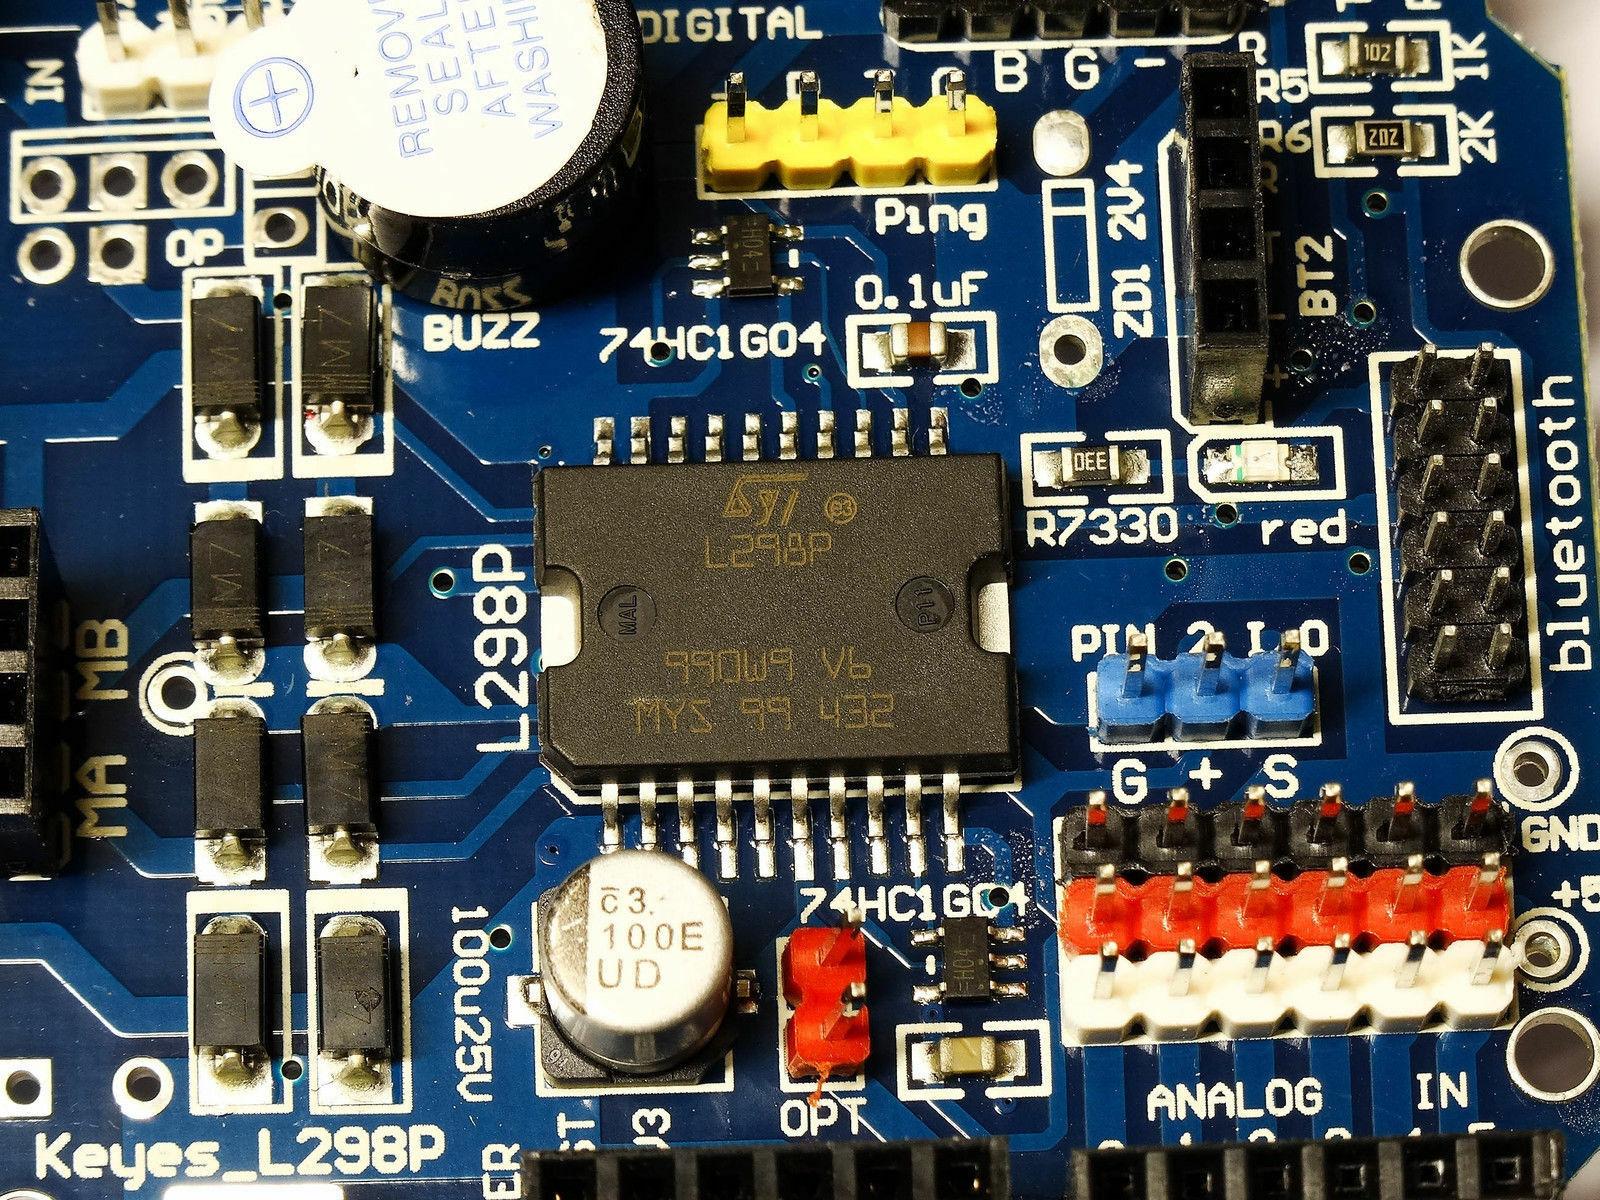 واقي محرك مزدوج H-Bridge L298P L298 ، 2x H-Bridge لـ Arduino